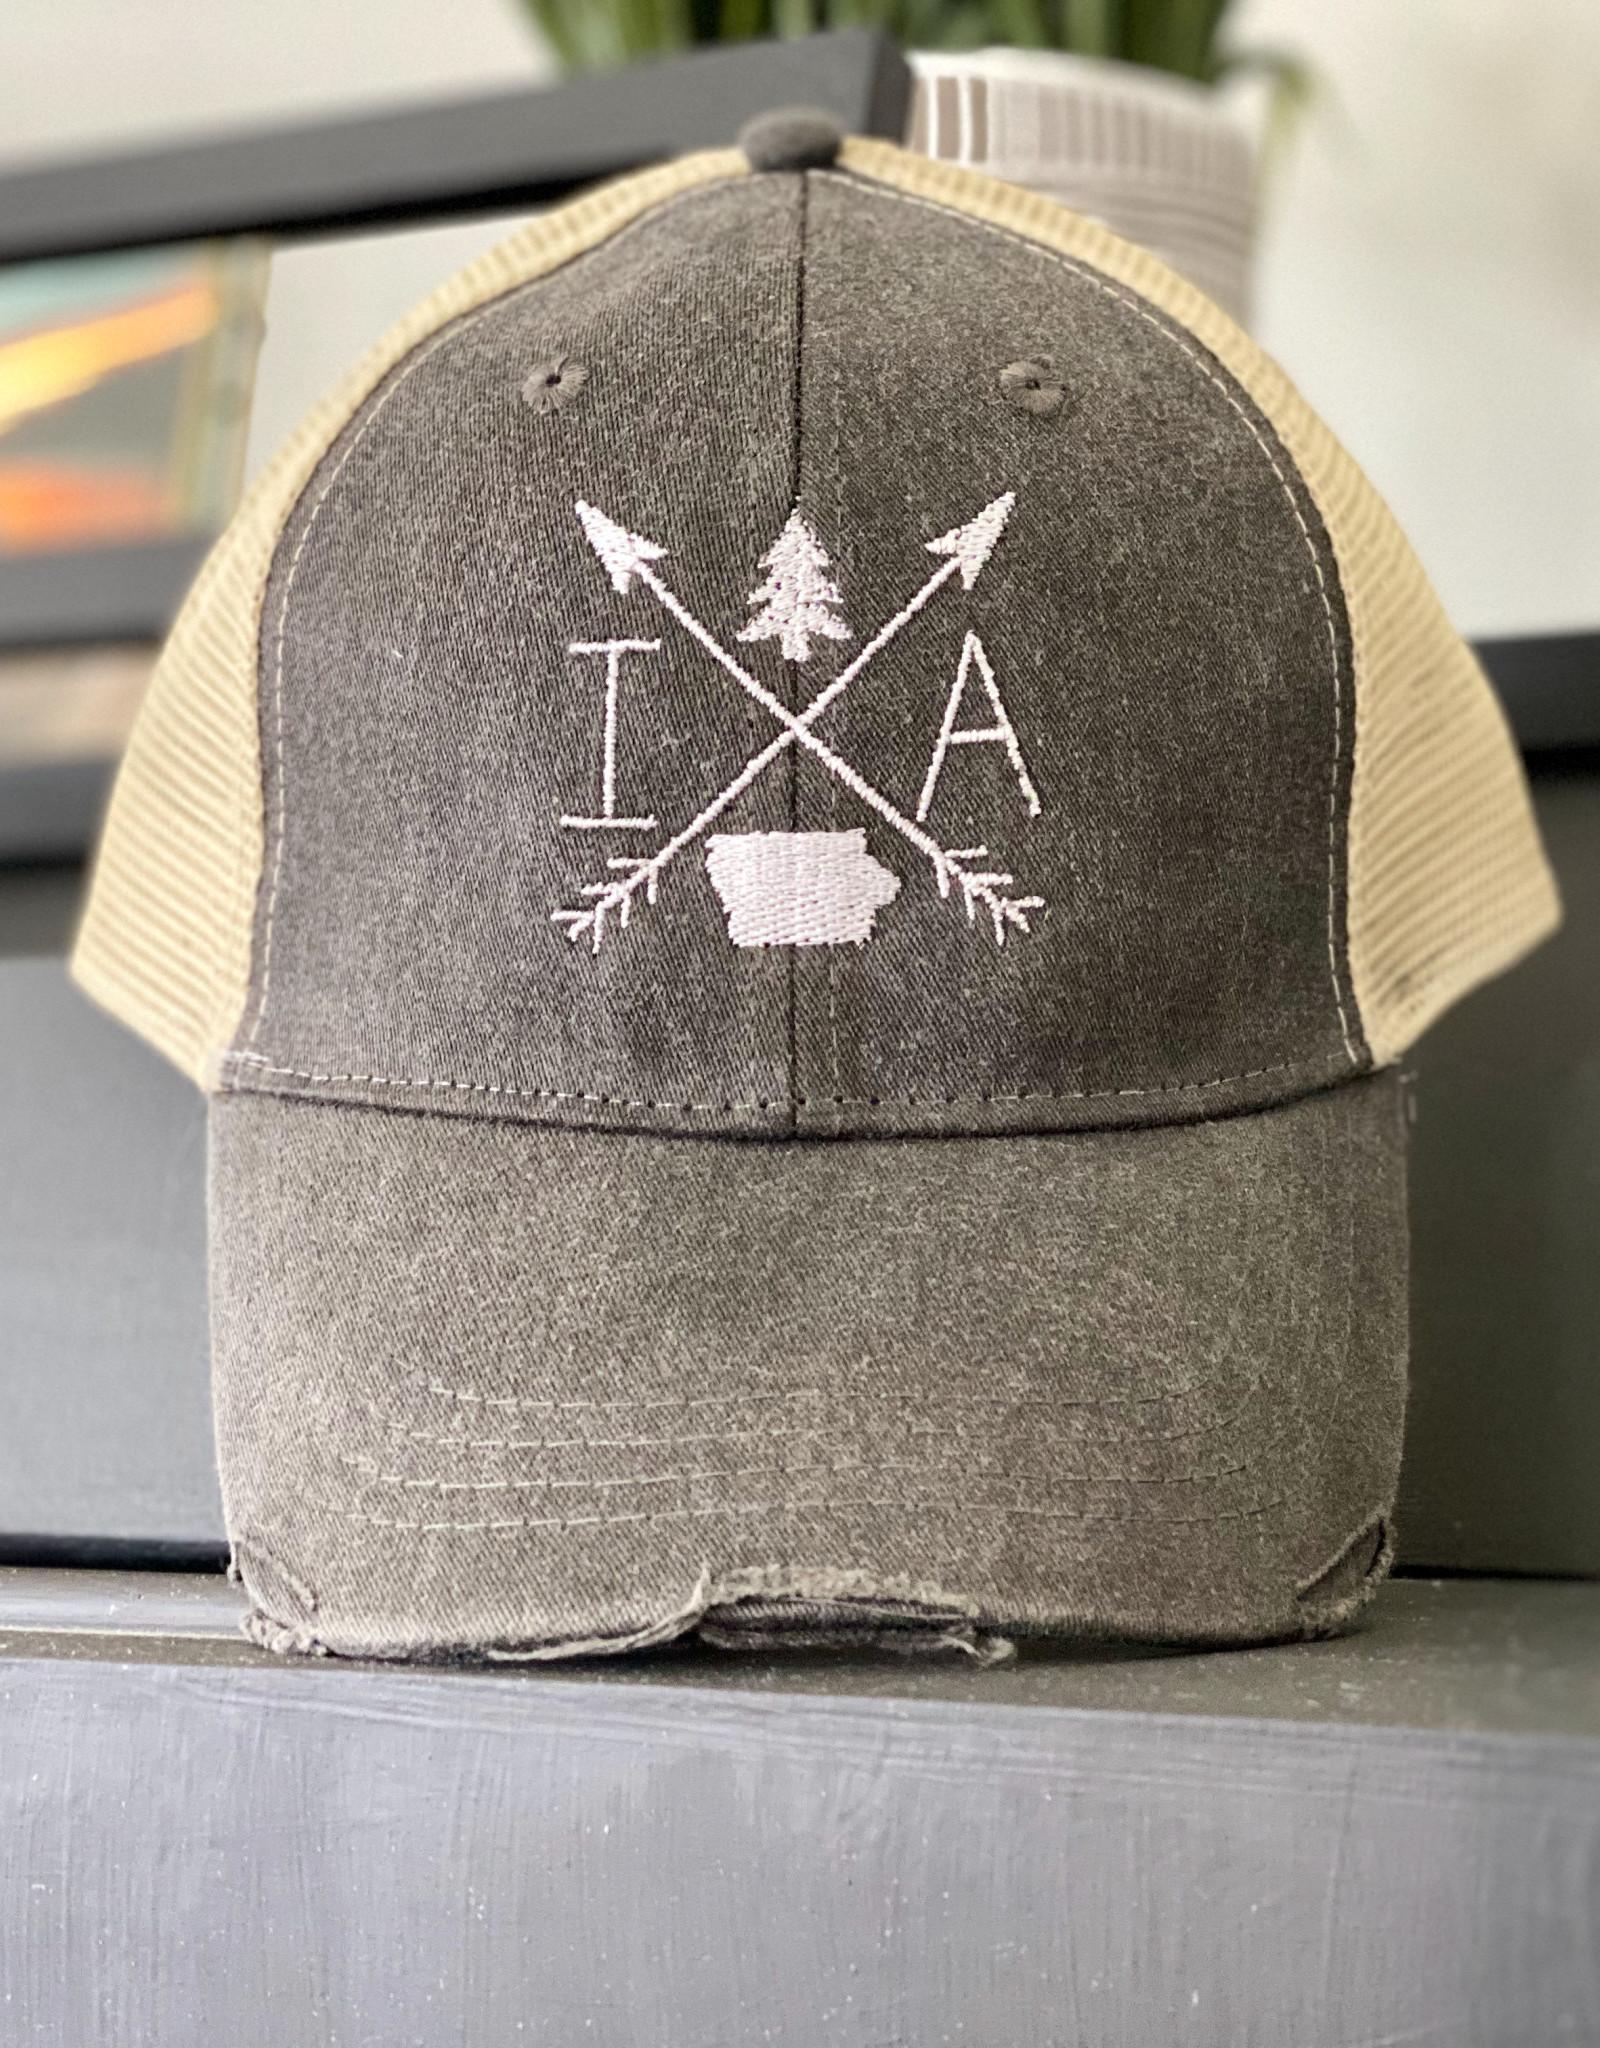 Gracie Designs Patched Hat - Iowa Arrow